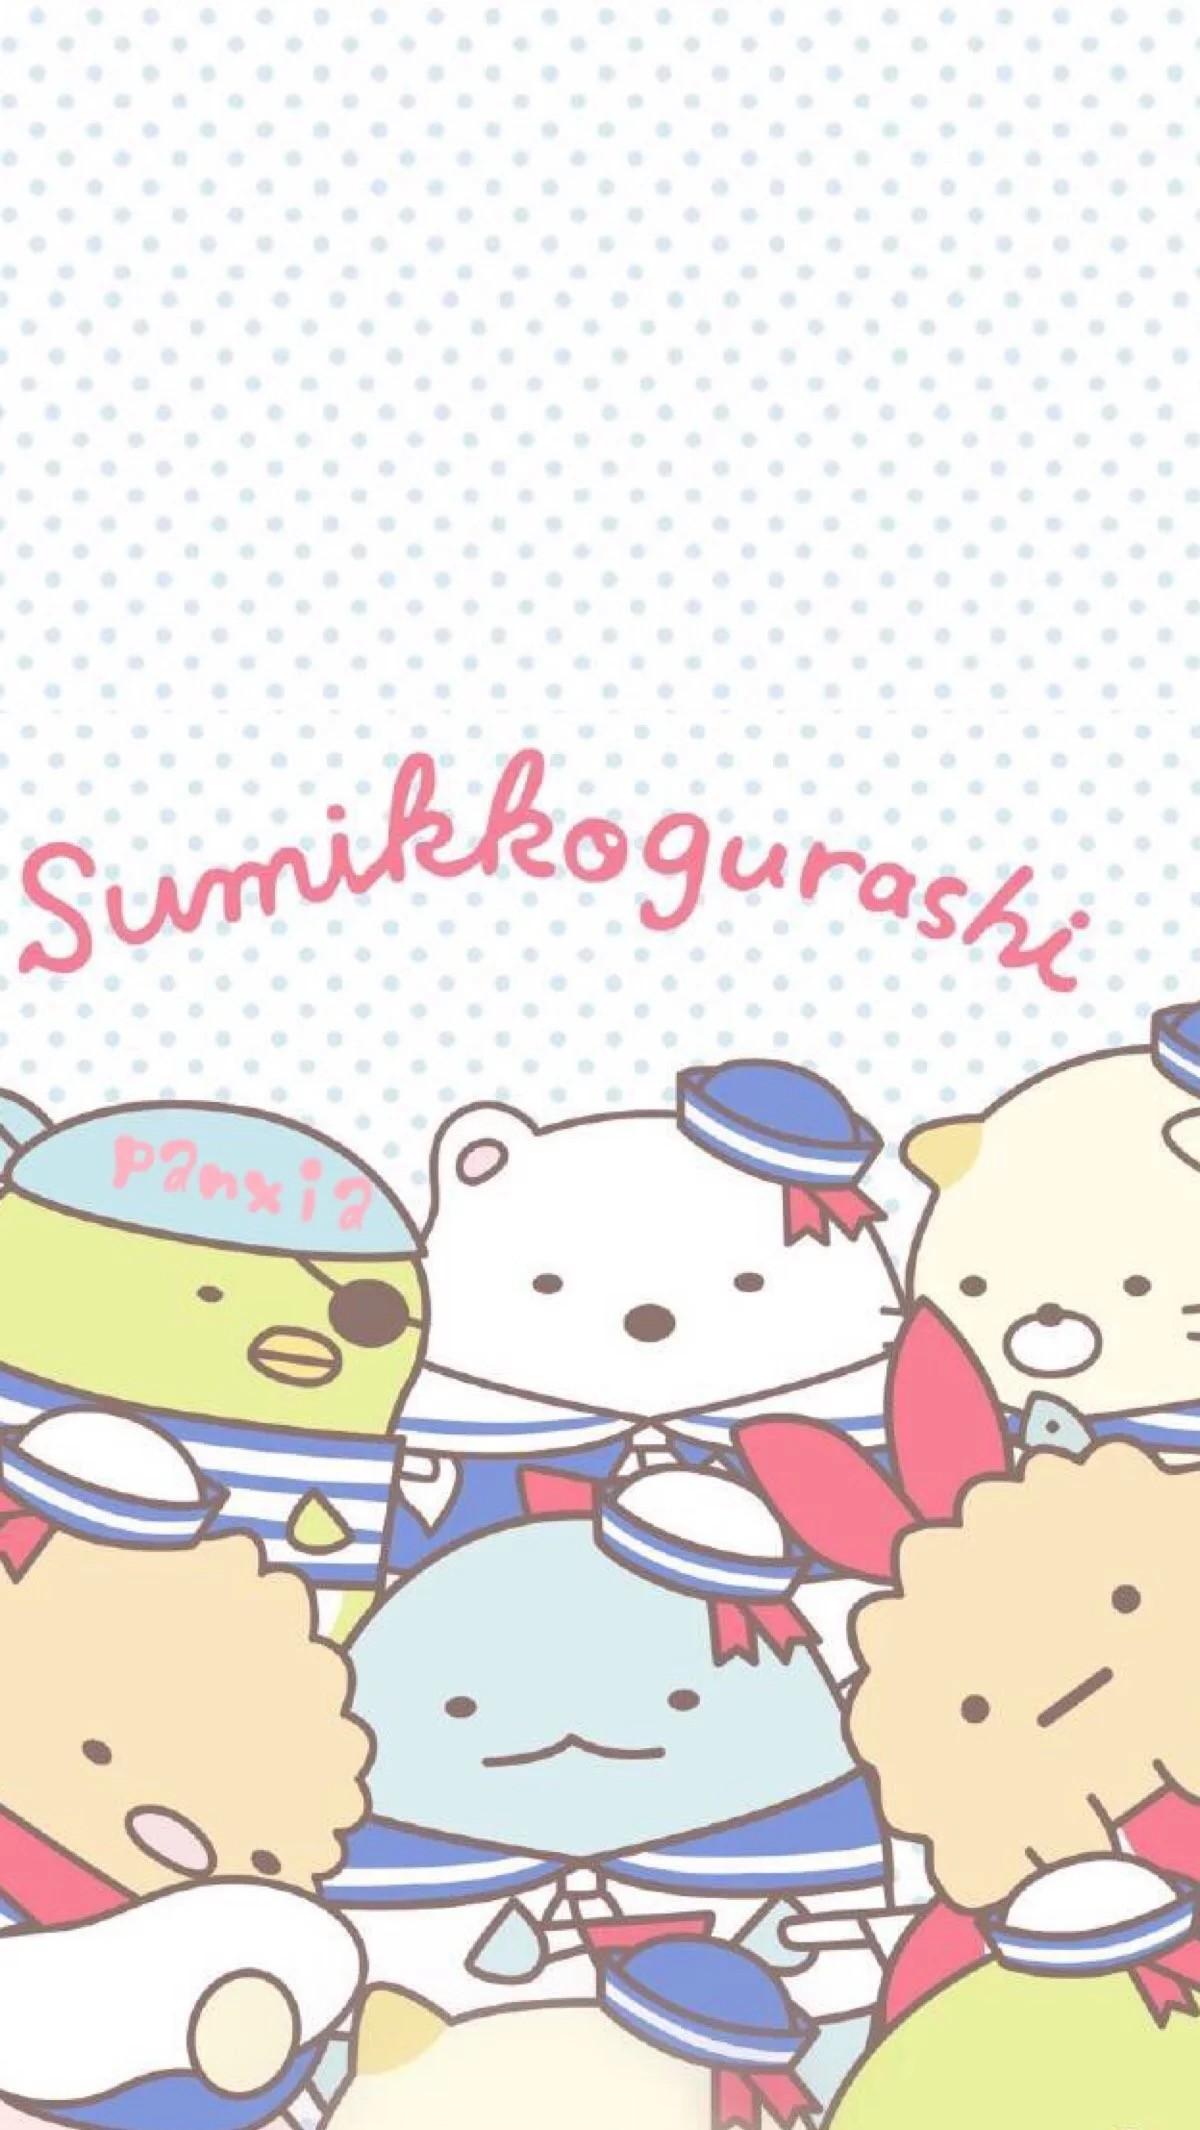 Sumikko gurashi sailors phone wallpaper